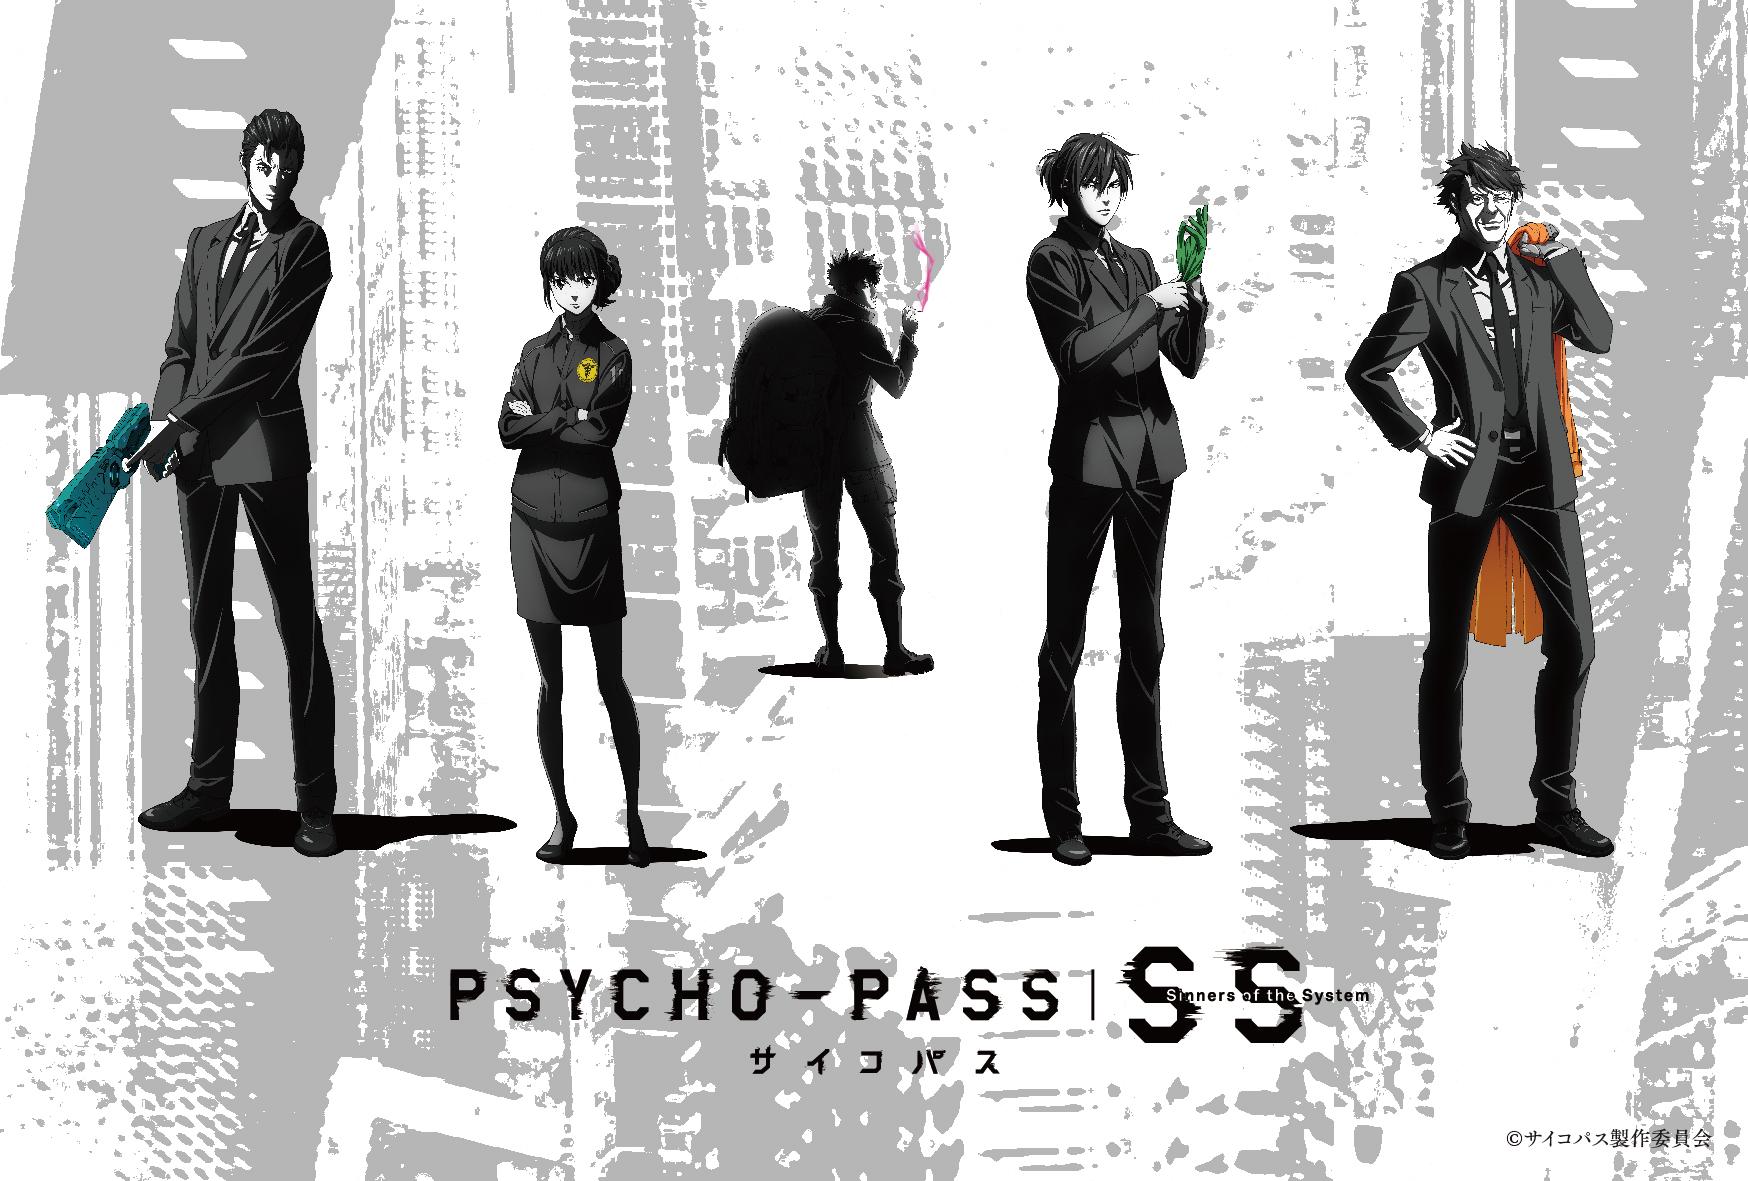 『PSYCHO-PASS サイコパス Sinners of the System』ムビチケ購入特典 (C)サイコパス製作委員会